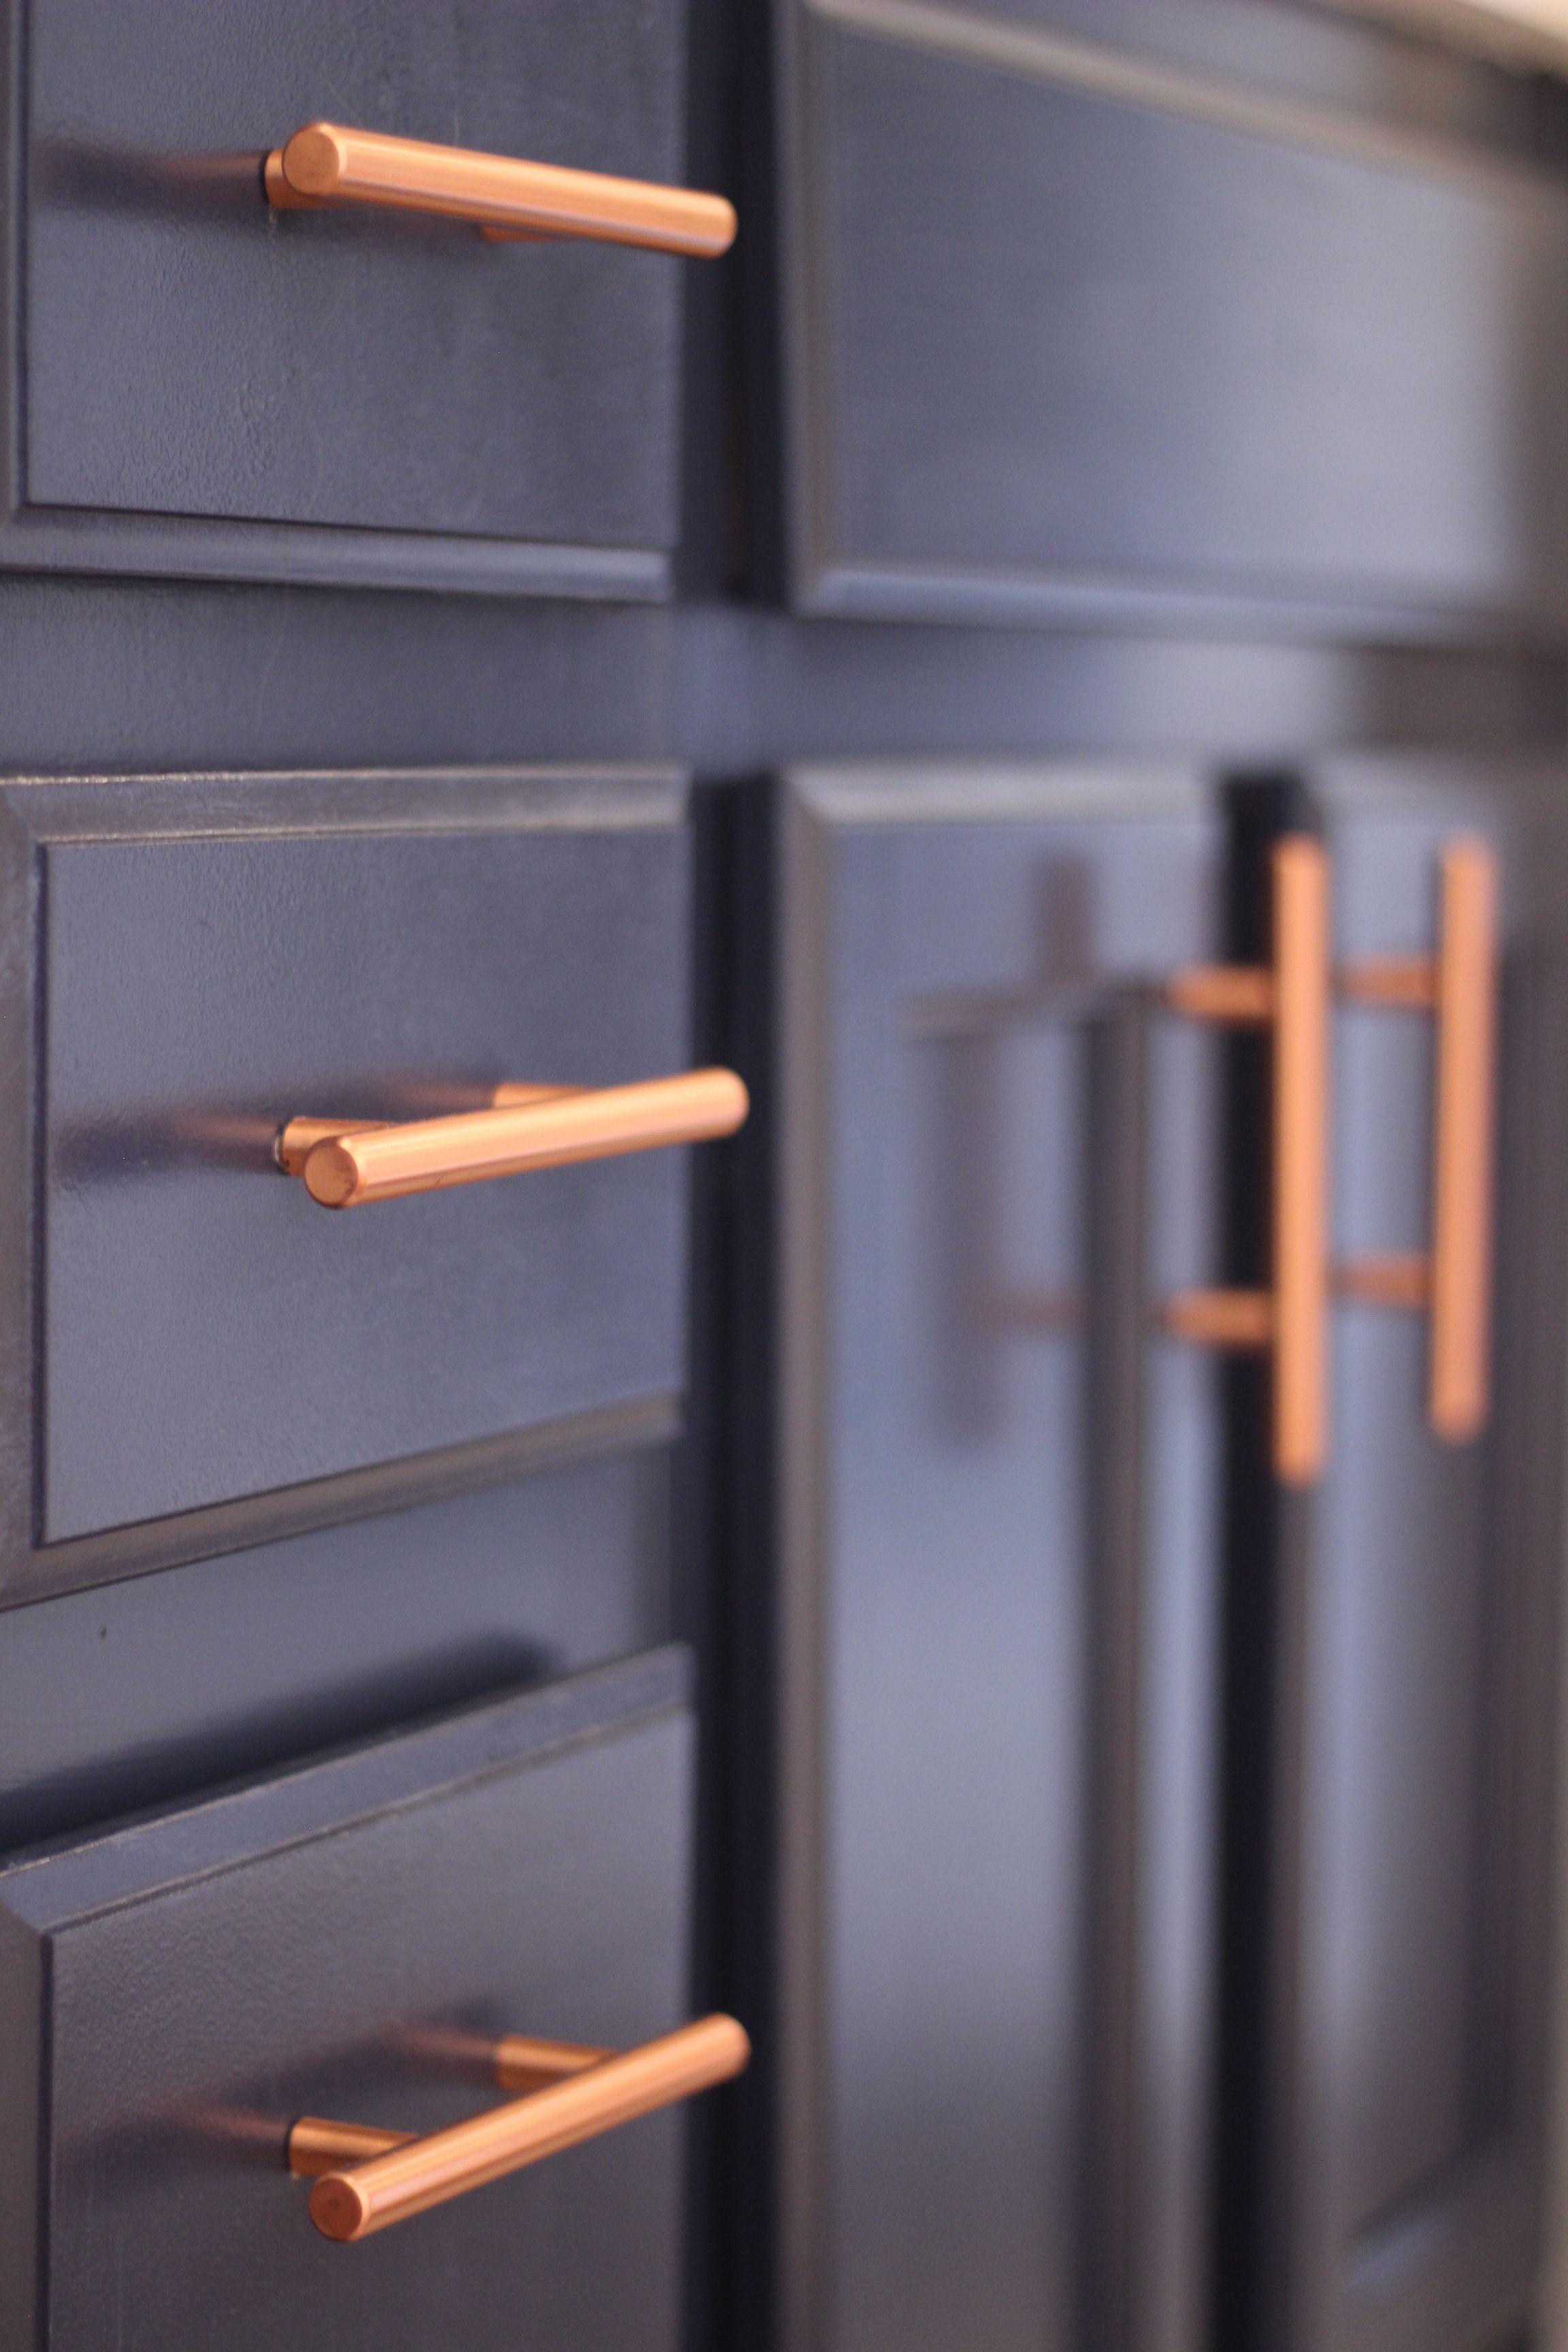 Copper Kitchen Cabinet Knobs And Pulls Kitchen Remodel Summer 18